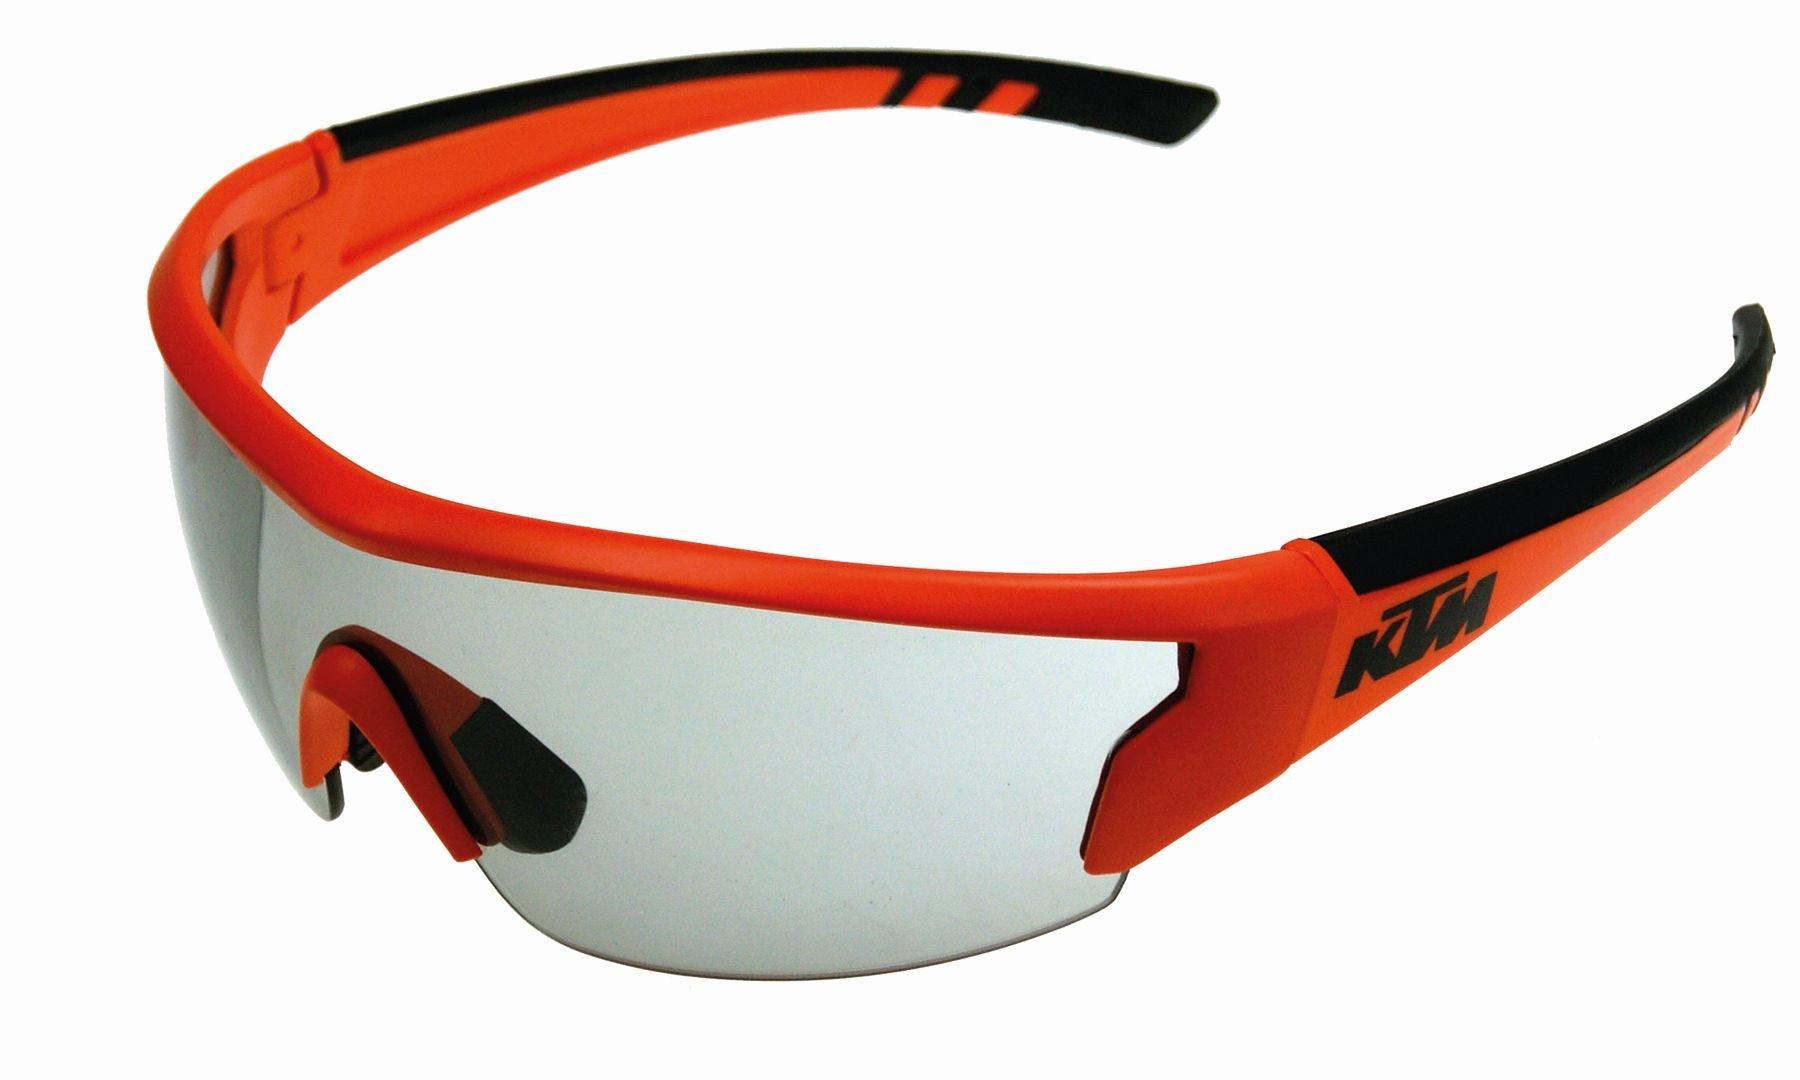 KTM Sonnenbrille Unisex Factory Team Photochromic C1-3